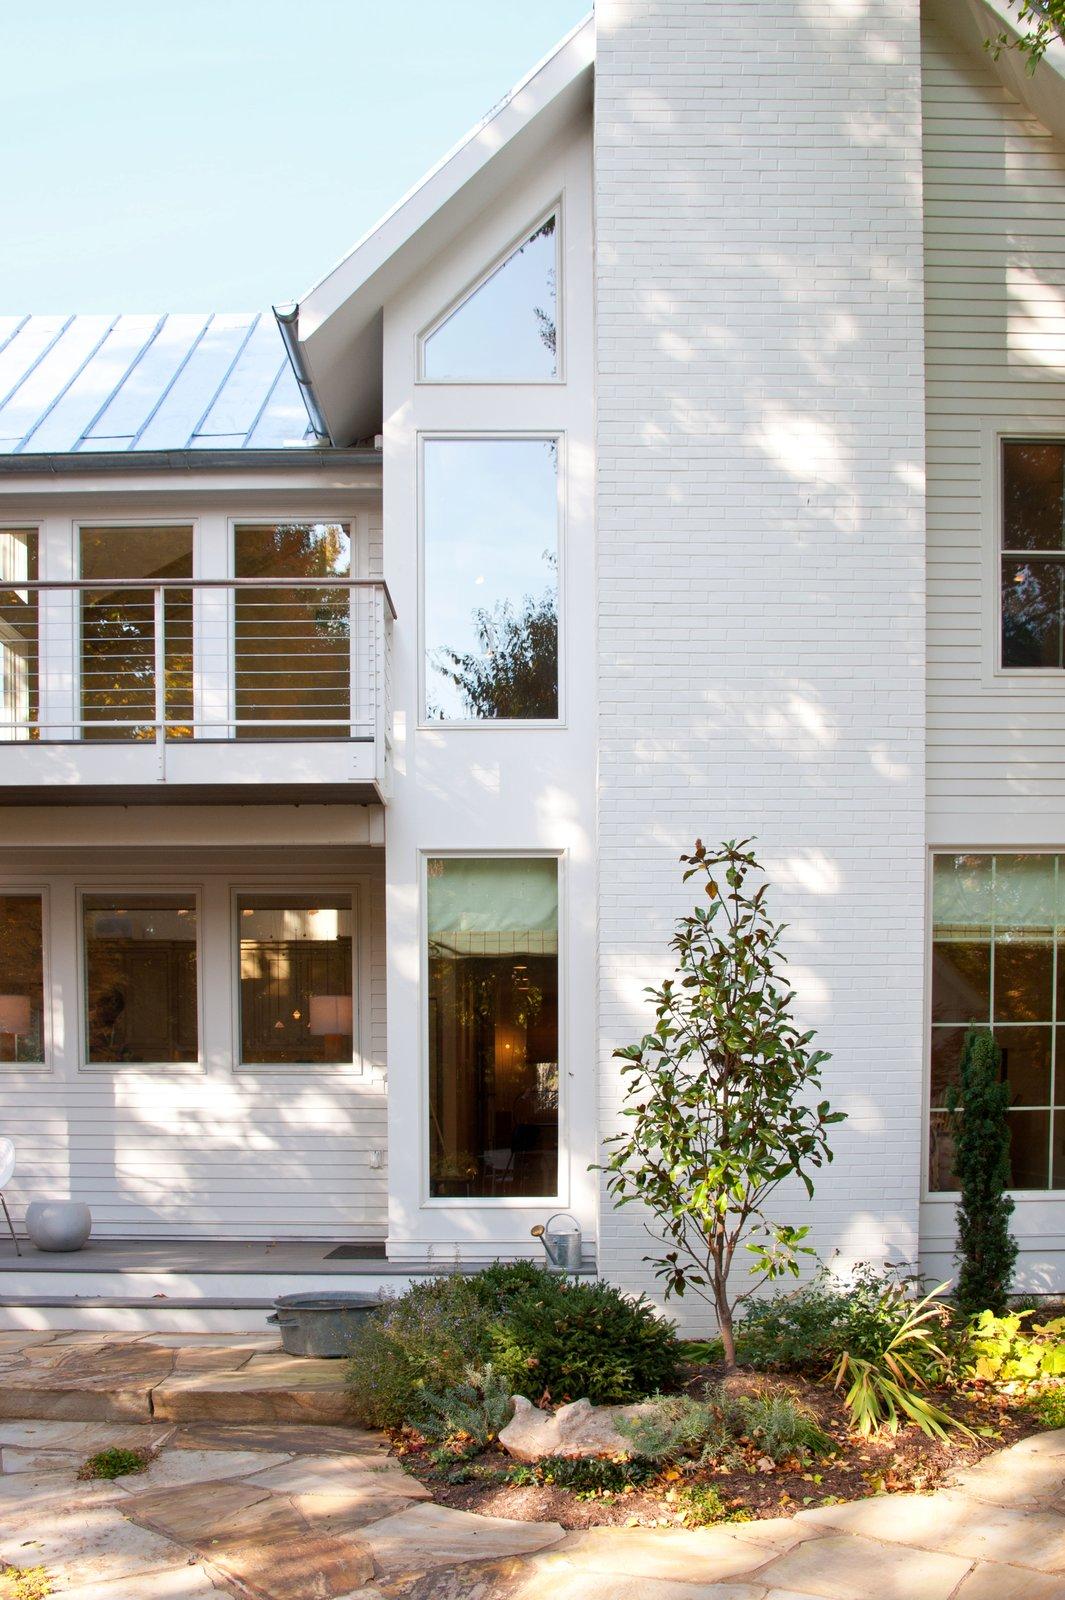 Urban Farmhouse by ONE 10 STUDIO Architects